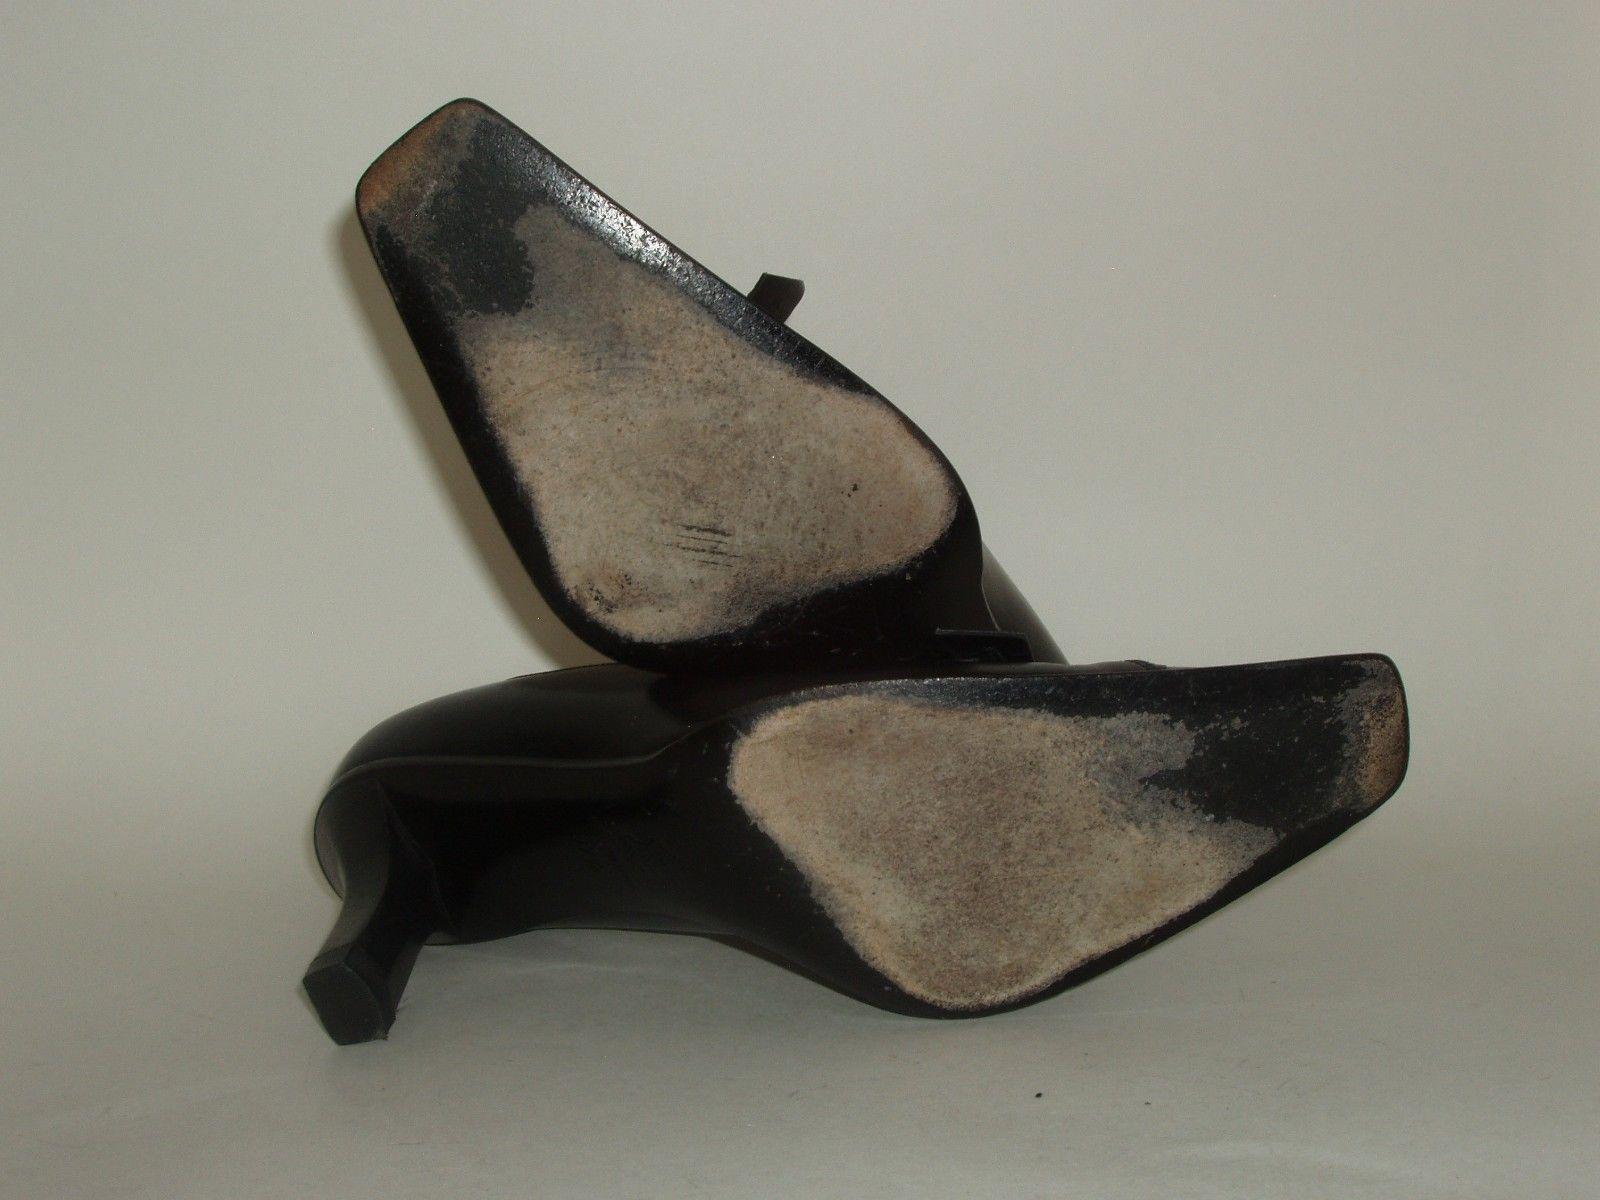 Roberto Botticelli Italian Made Black Leather High Heel Shoes Euro 37.5 US 7.5 image 6